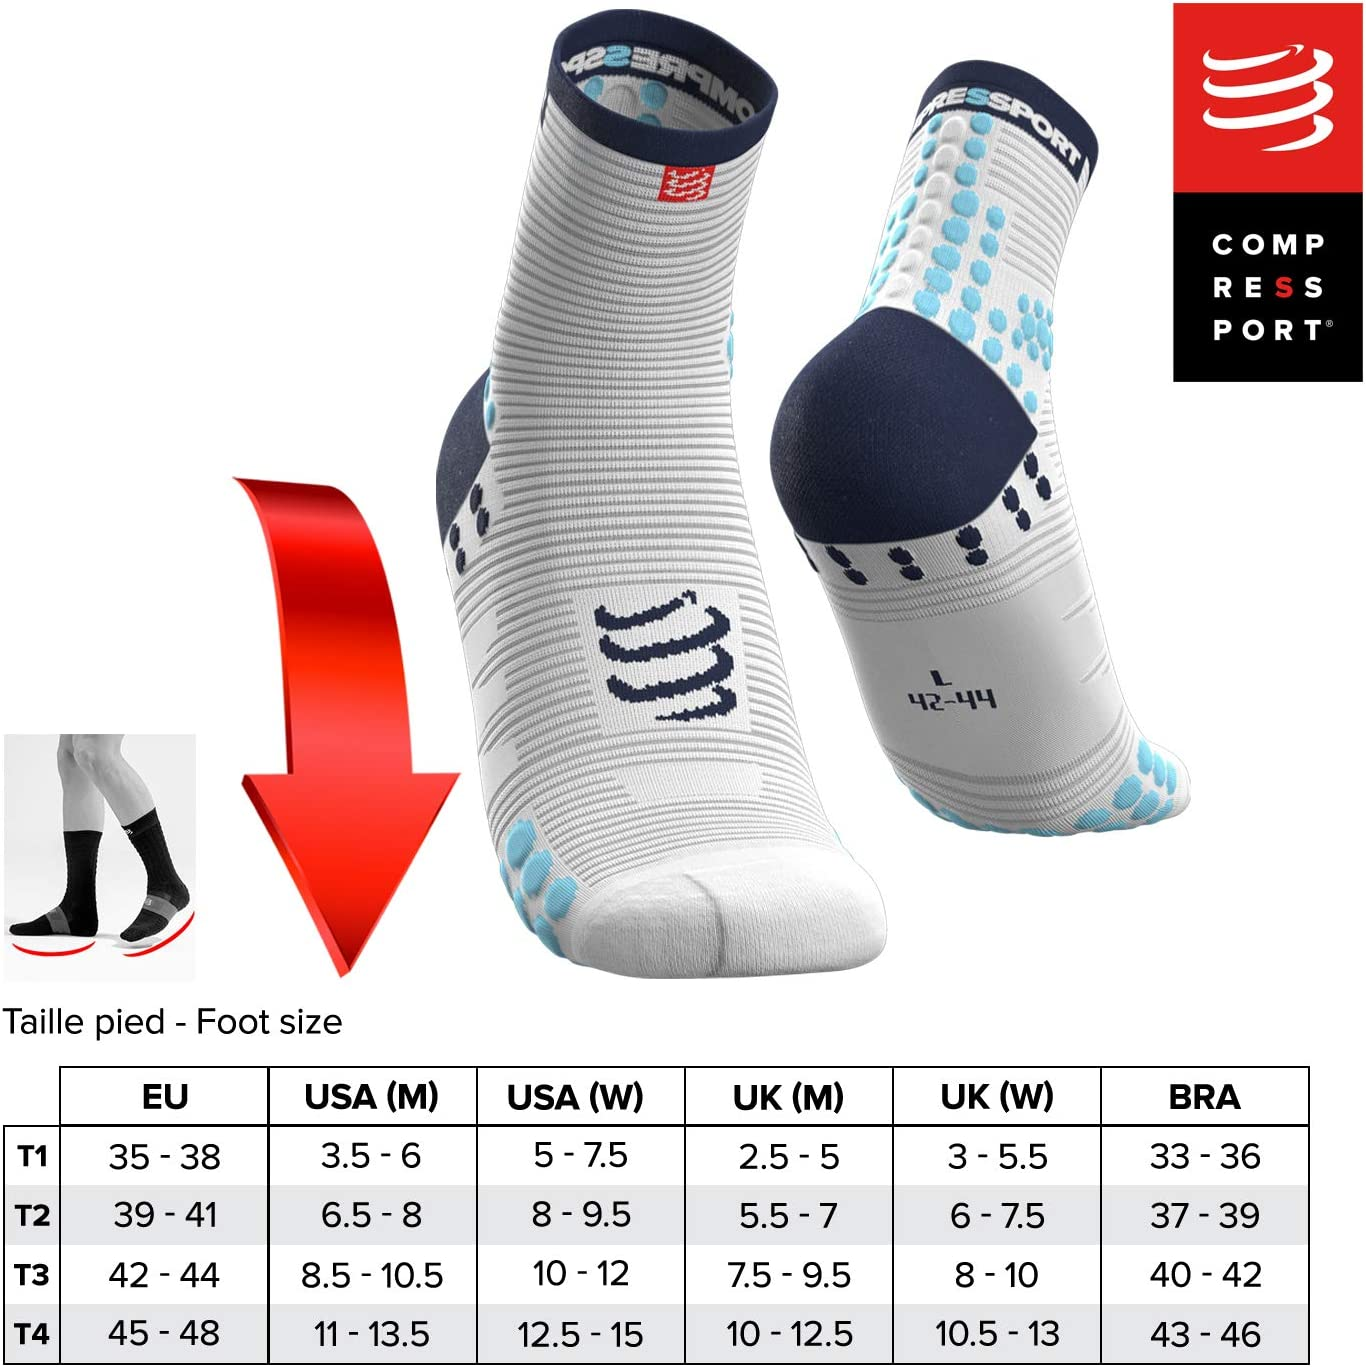 T4 Blanco//Azul COMPRESSPORT Pro Racing Socks v3.0 Run High Calcetines para Correr Unisex-Adult